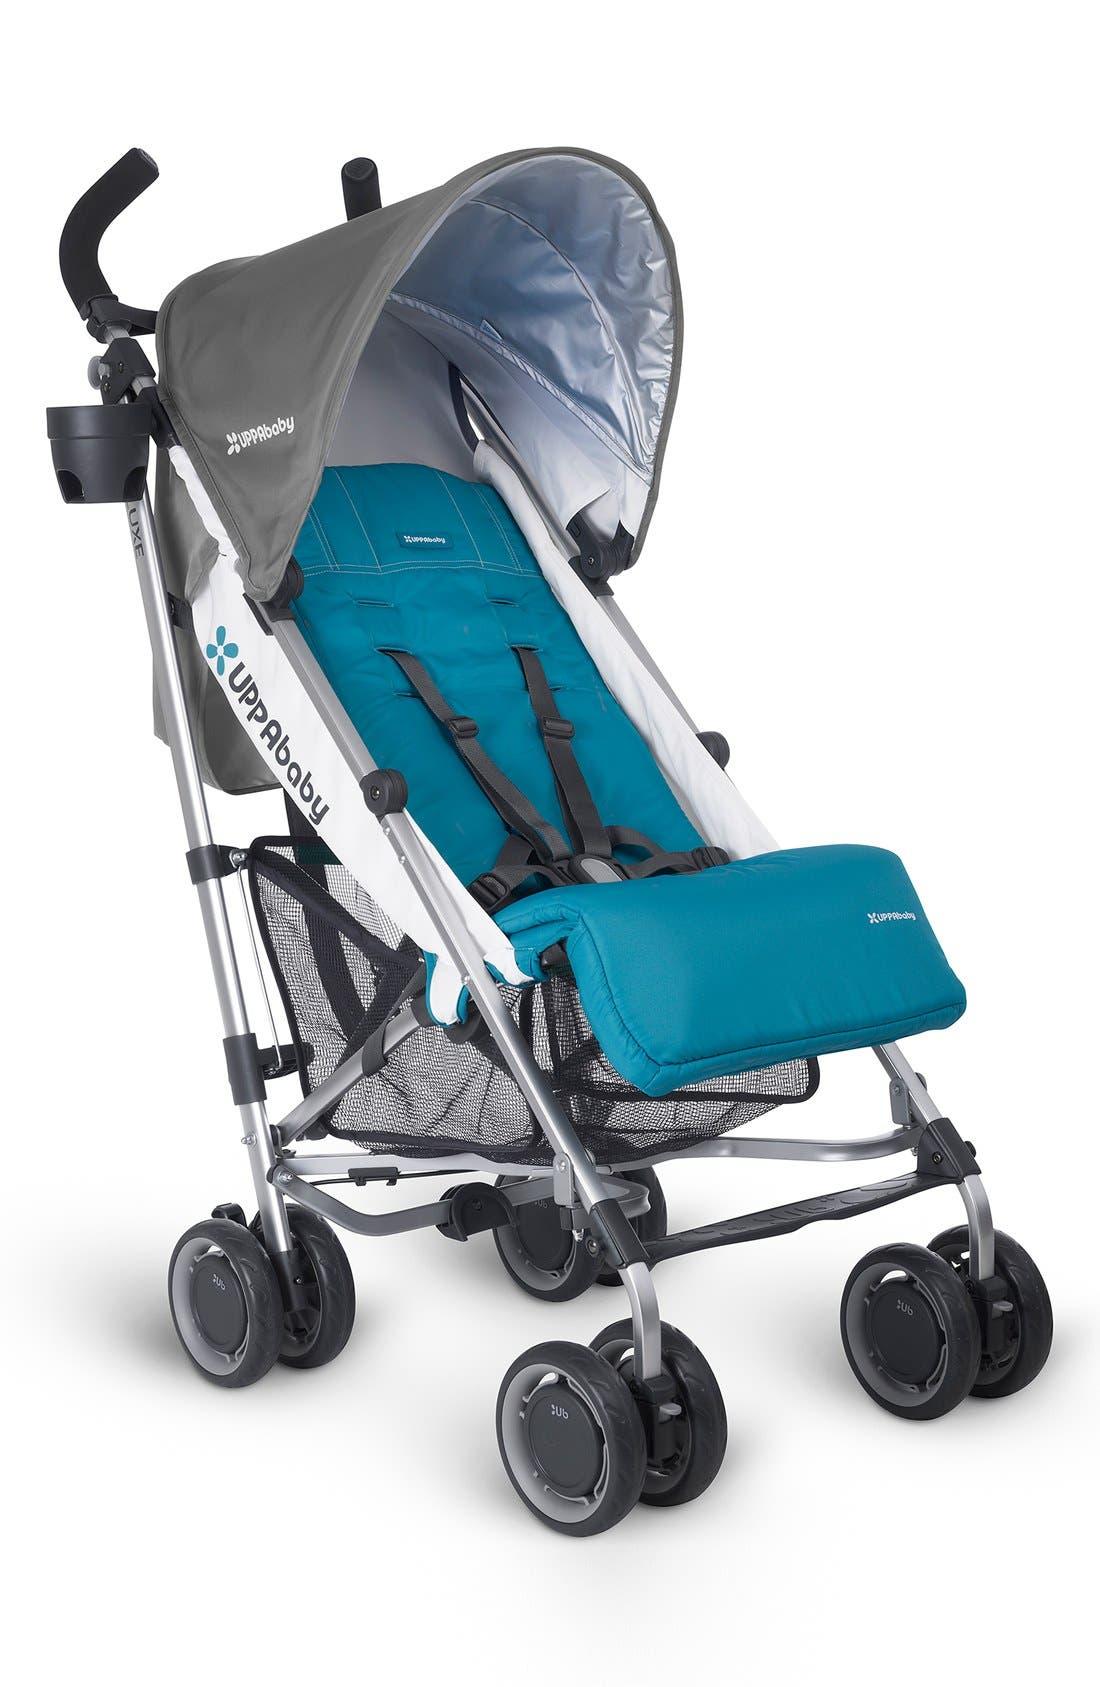 2015 G-LUXE - Aluminum Frame Reclining Umbrella Stroller,                             Main thumbnail 3, color,